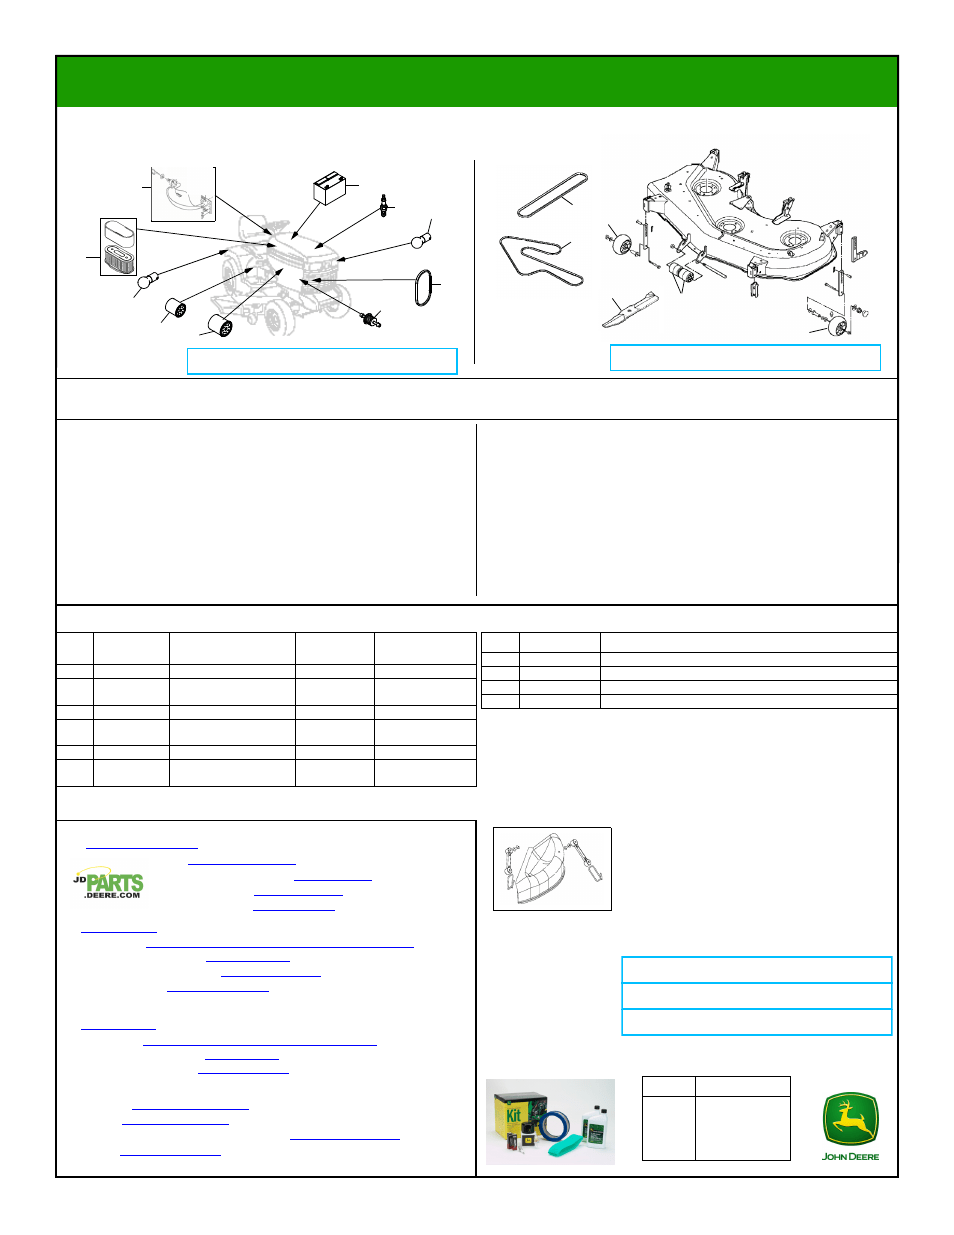 medium resolution of background image